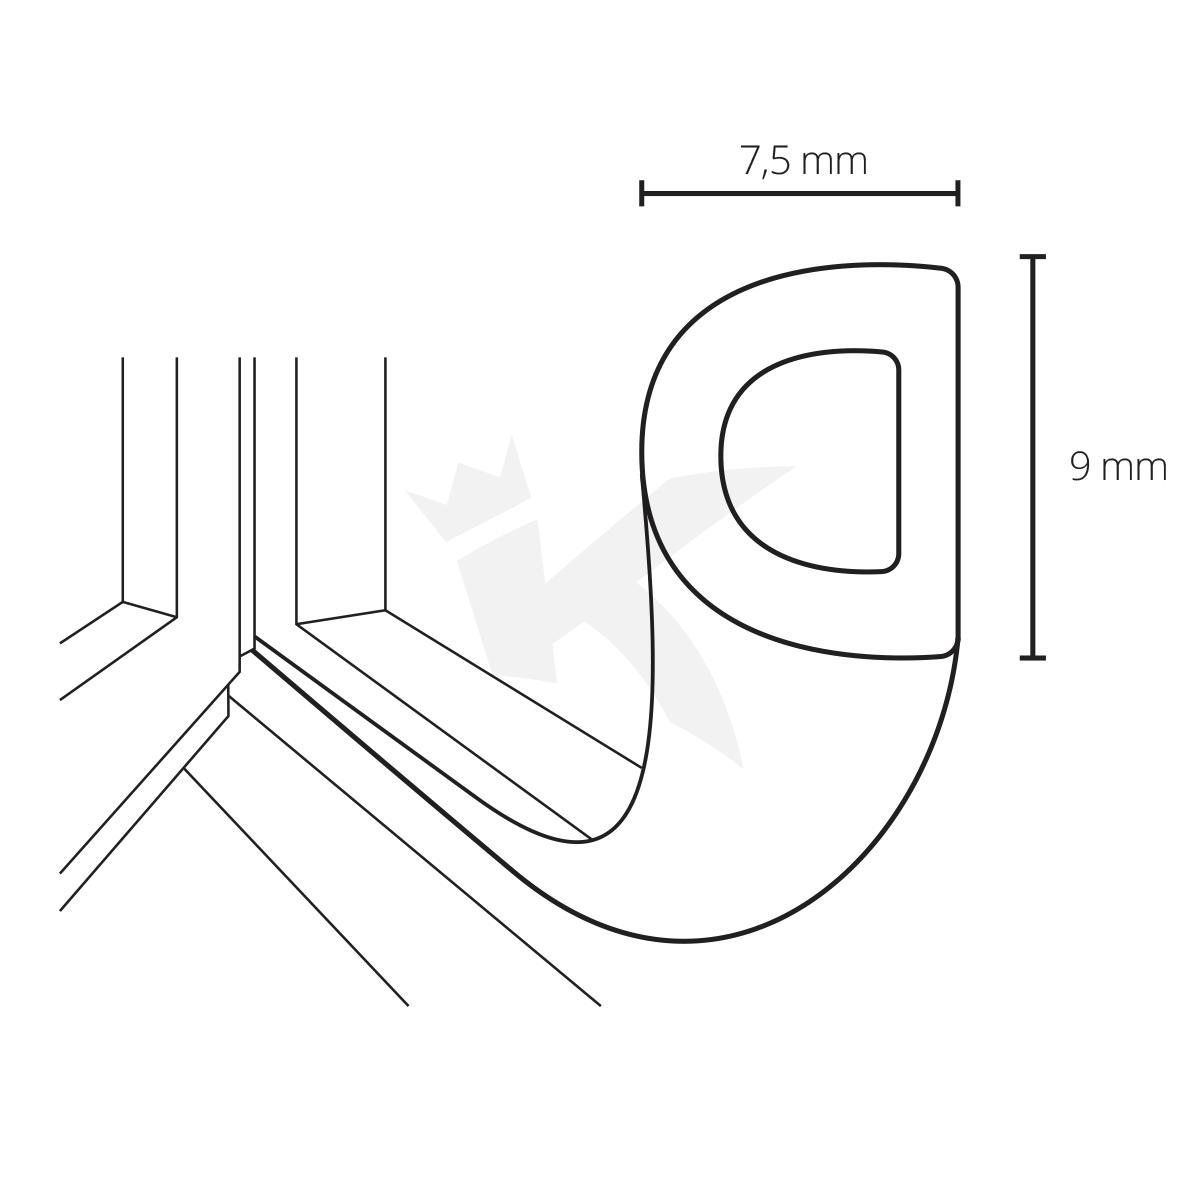 gummidichtung fensterdichtung t rdichtung selbstklebend epdm dichtband neu ovp ebay. Black Bedroom Furniture Sets. Home Design Ideas